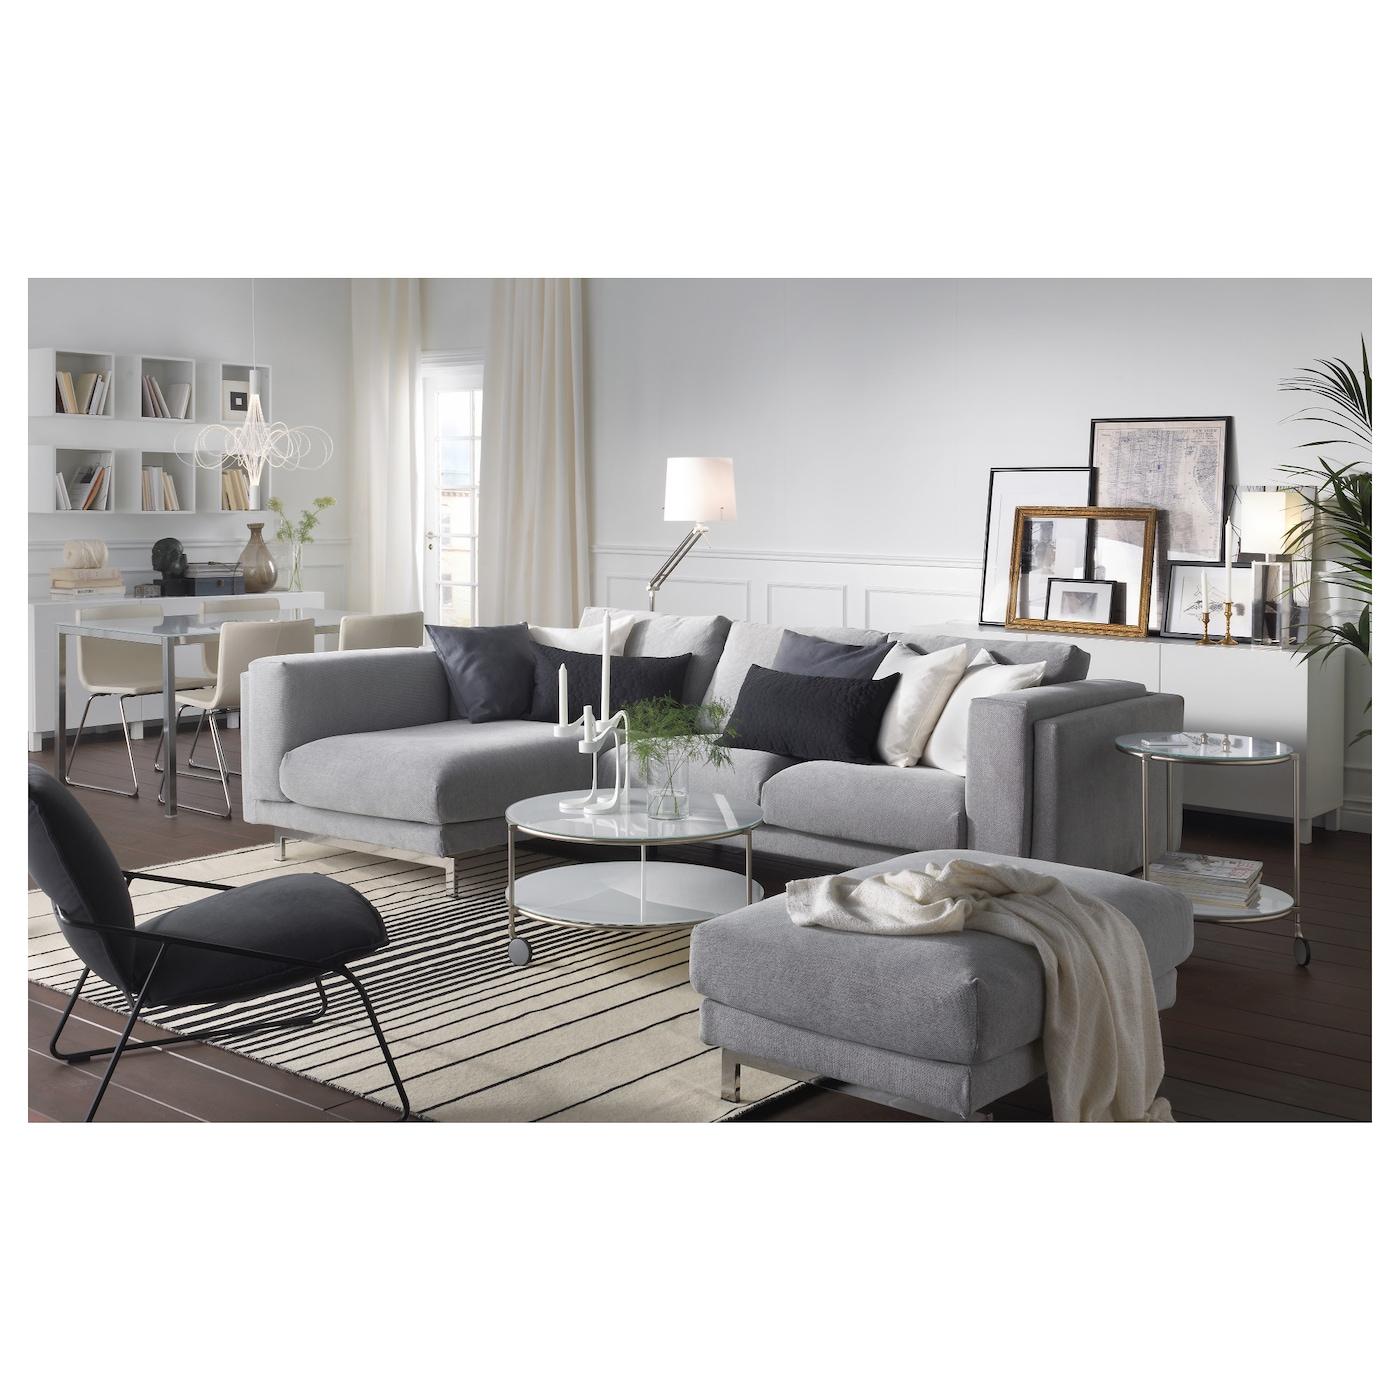 Ikea Zitbanken En Fauteuils.Zitbanken Fauteuils Ikea Nockeby 3 Seat Sectional Sofa